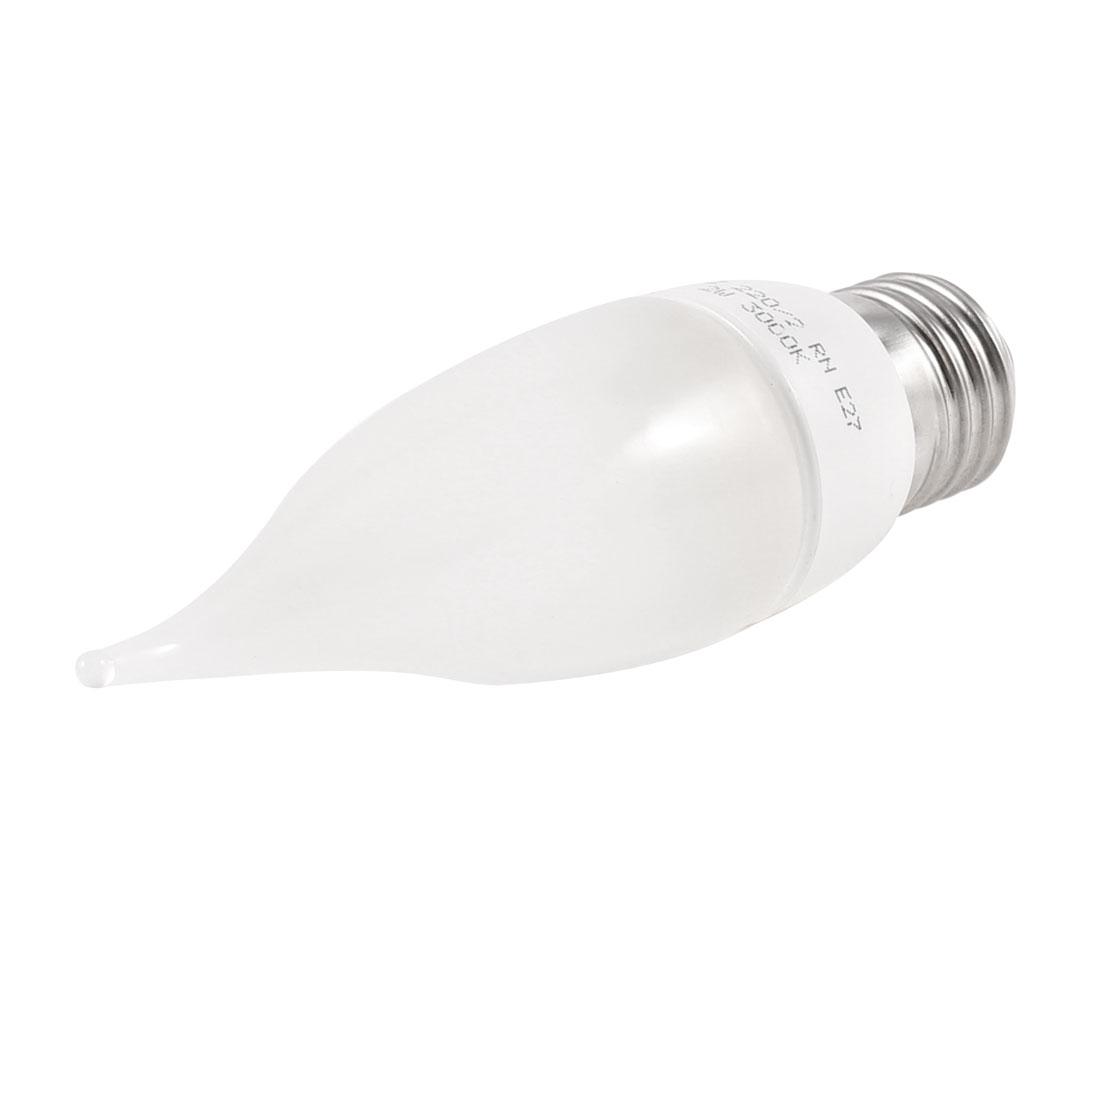 E27 Socket Energy Saving Yellow LED Pulled Tail Bulb Lamp AC 220V 2W 3000K